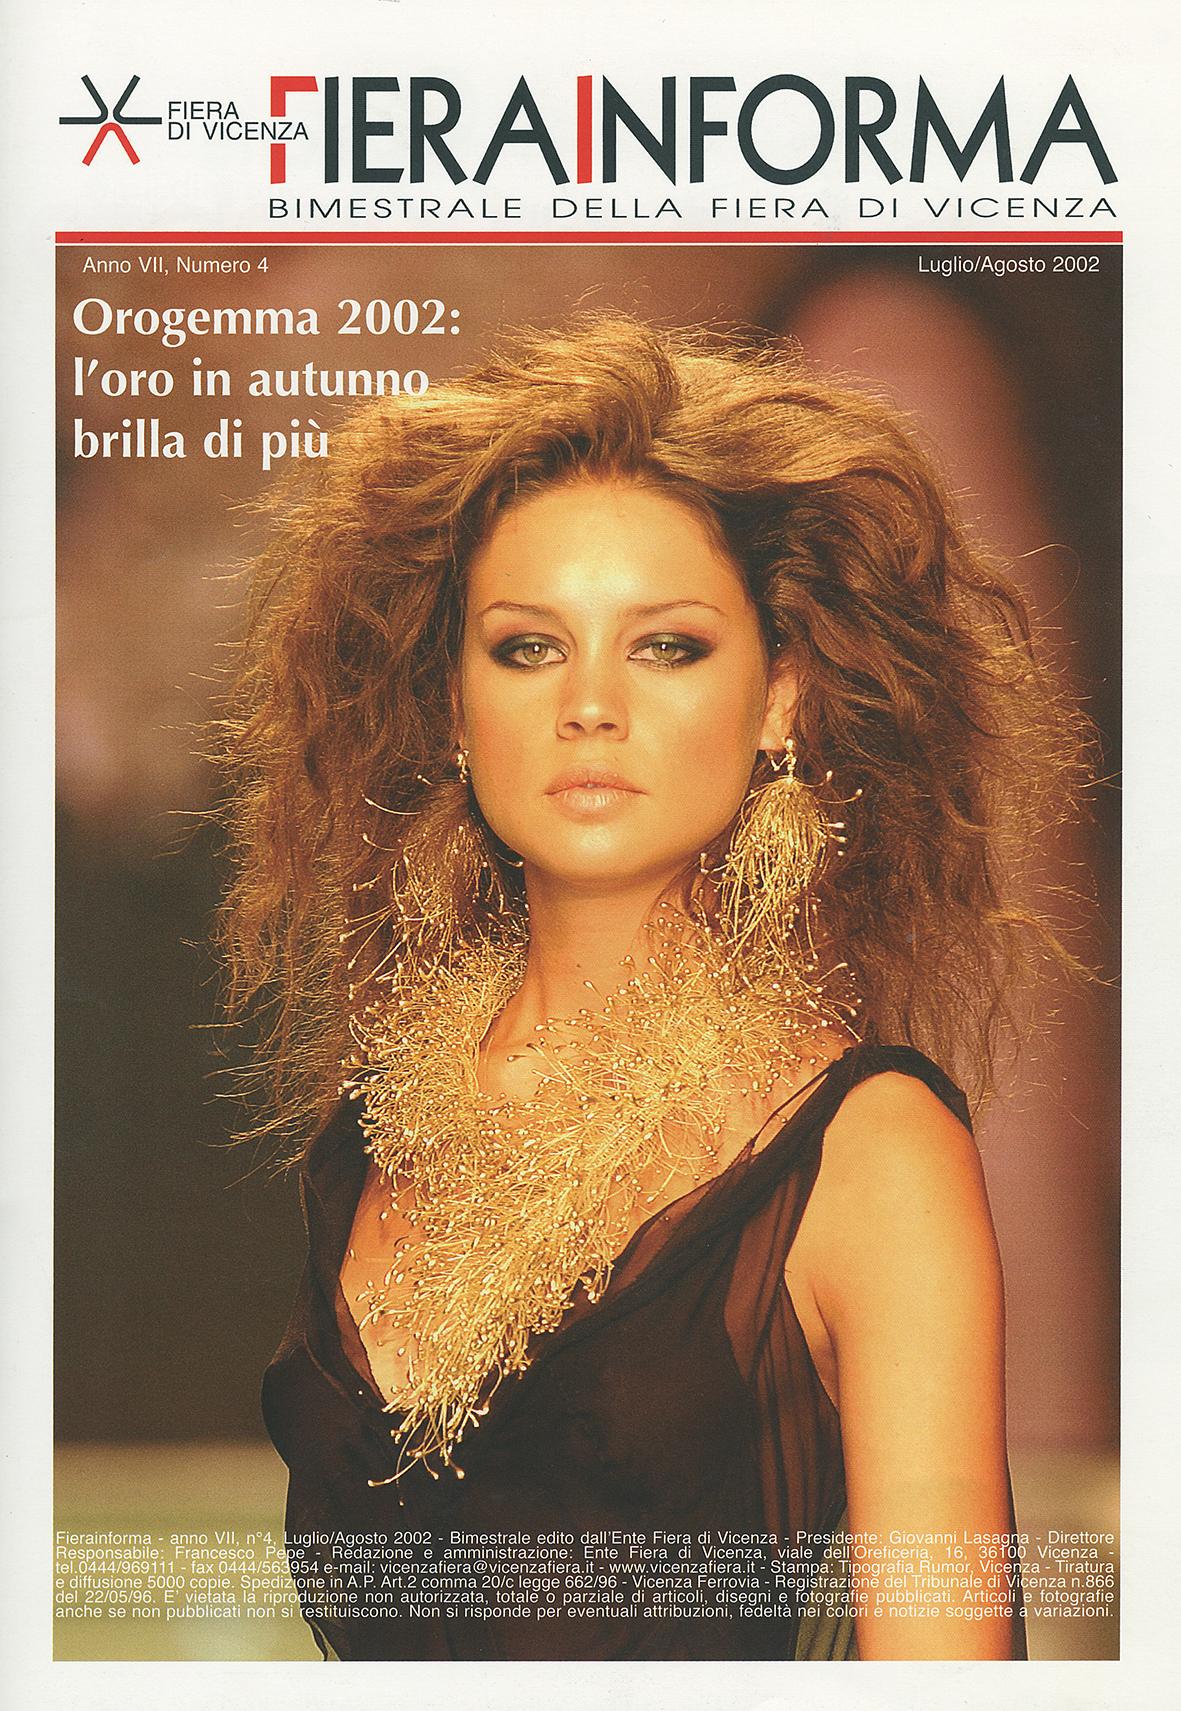 2002 Fierainforma Cover.jpg